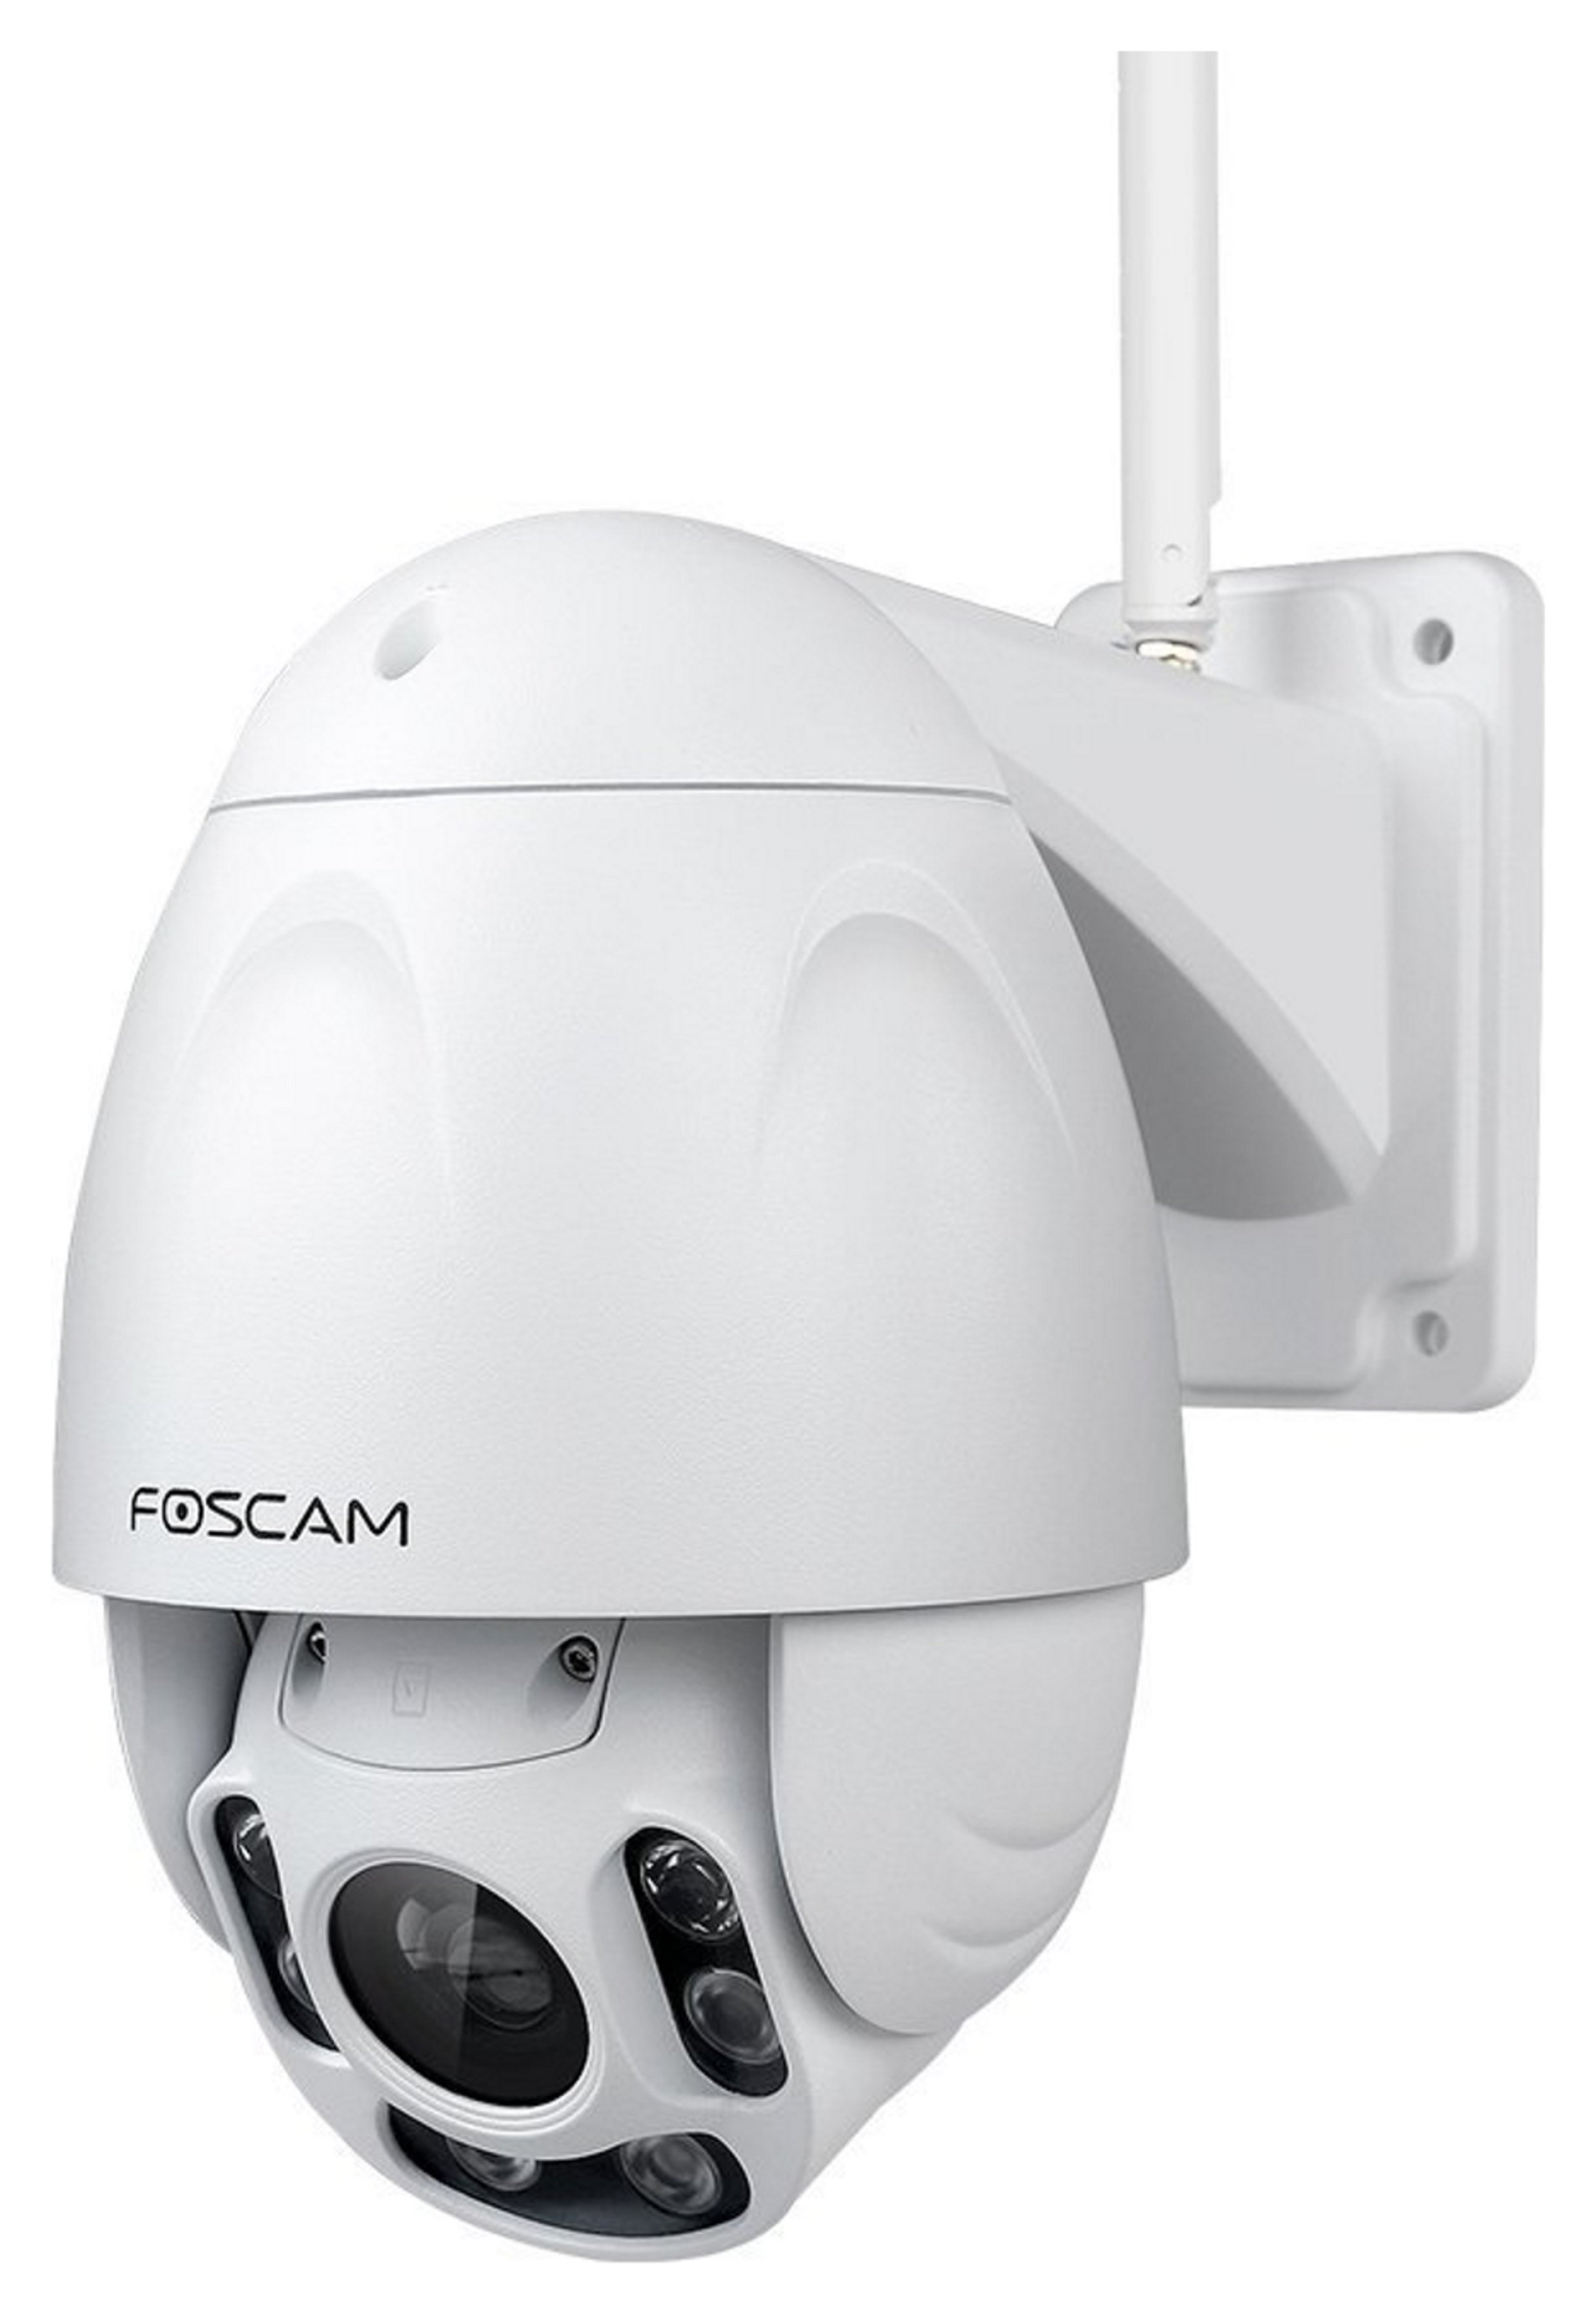 Image of Foscam FI9928P Outdoor Dome Wireless Camera